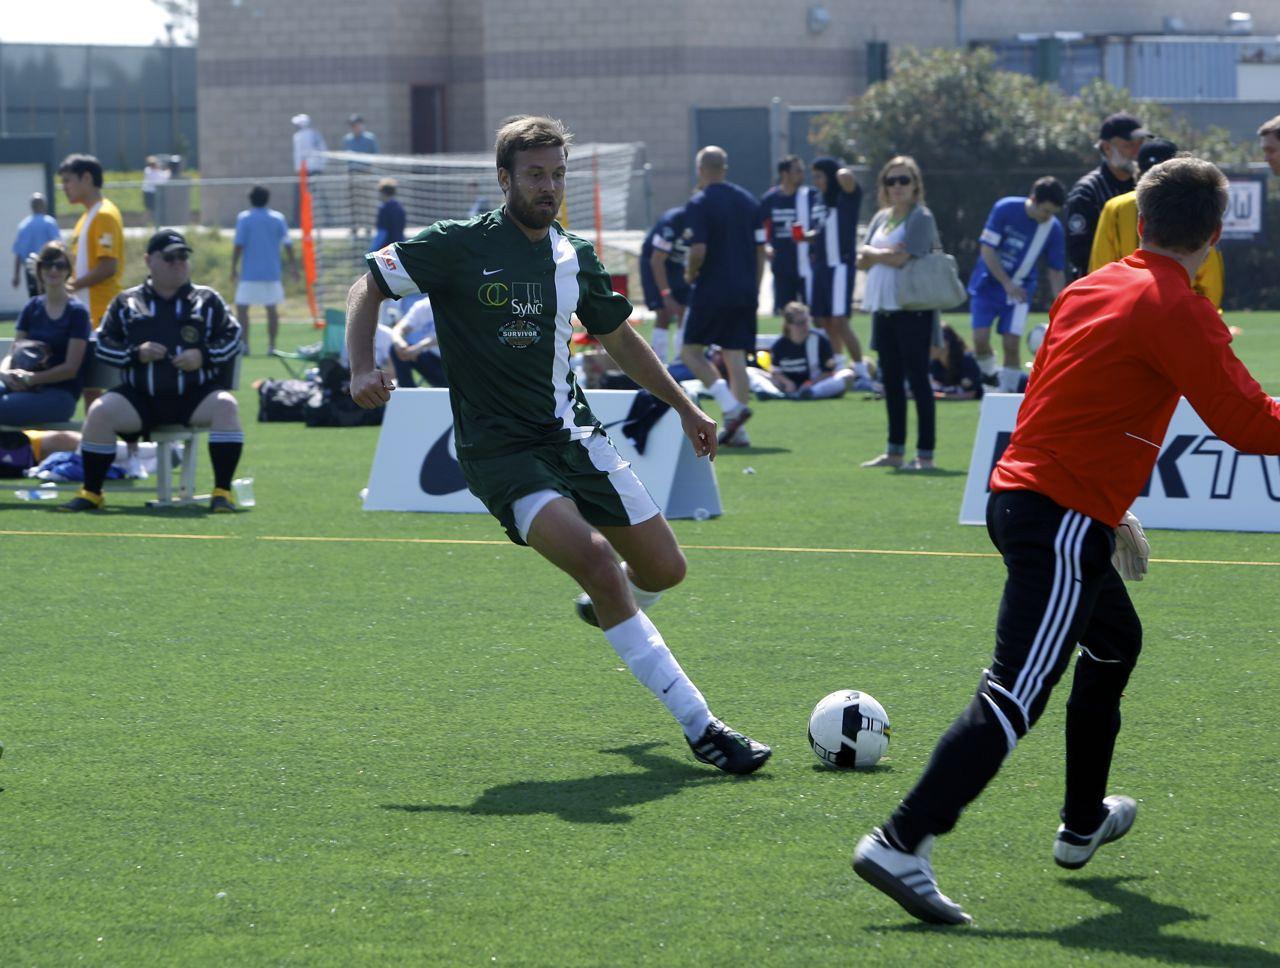 Aras plays soccer